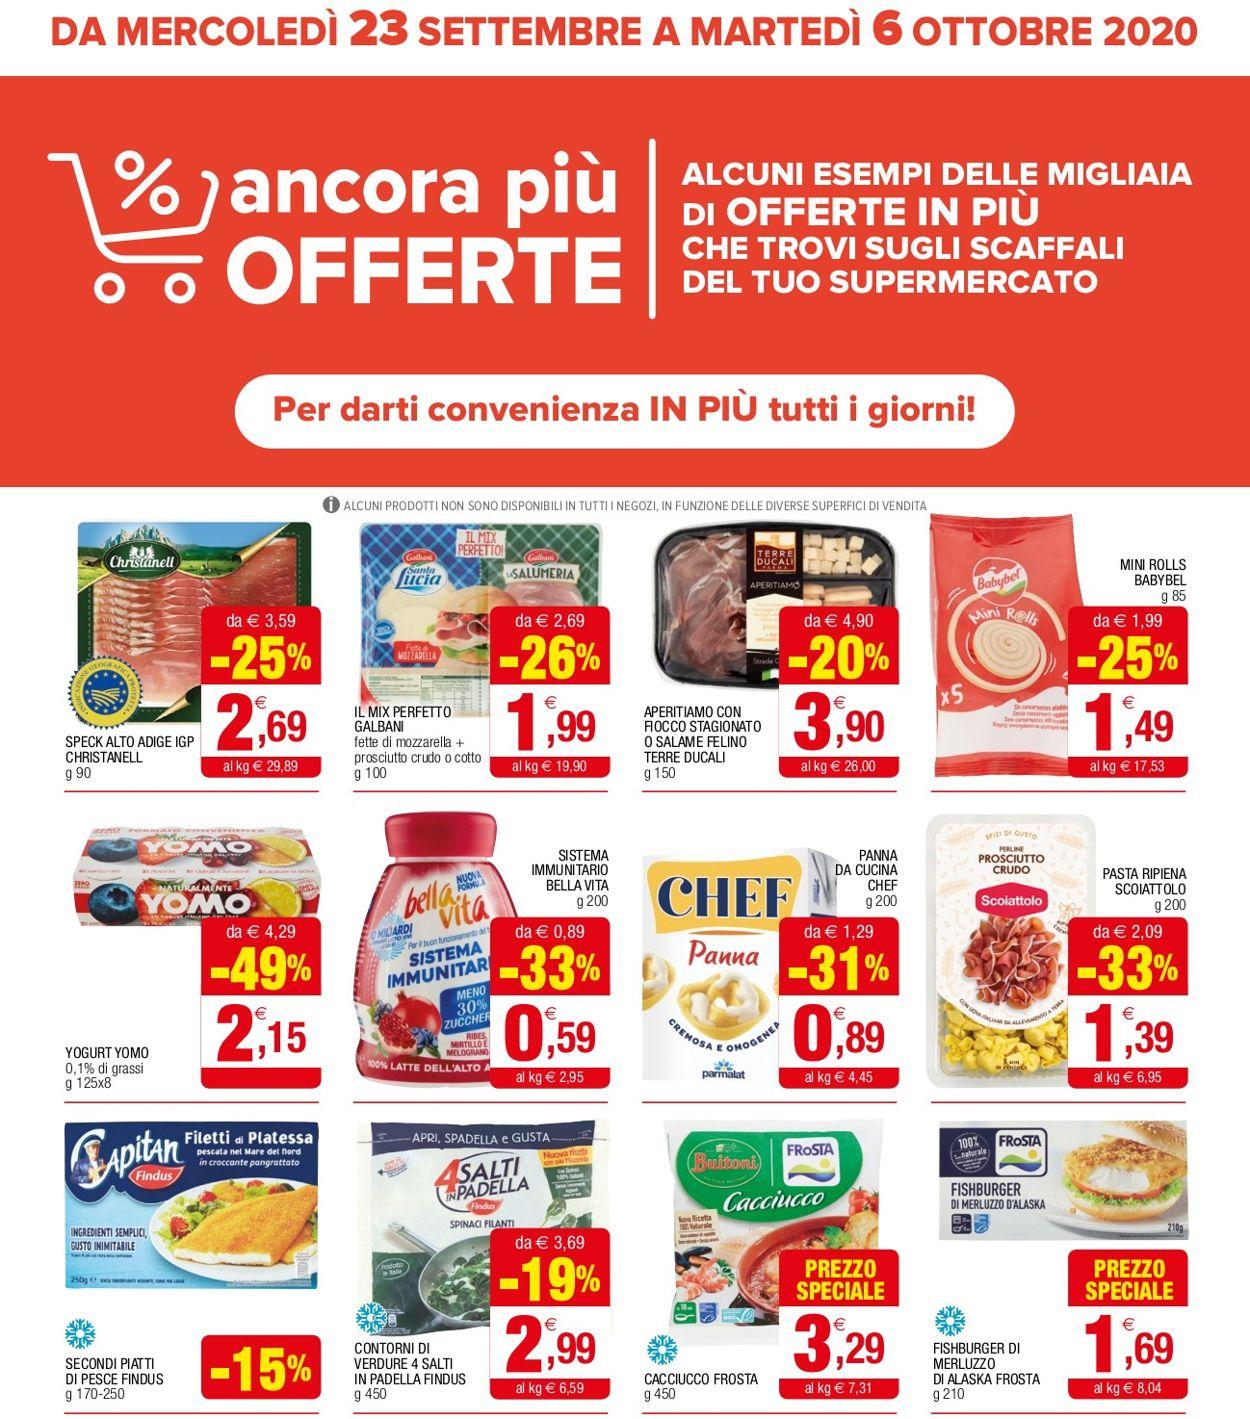 Volantino Iperal - Offerte 23/09-06/10/2020